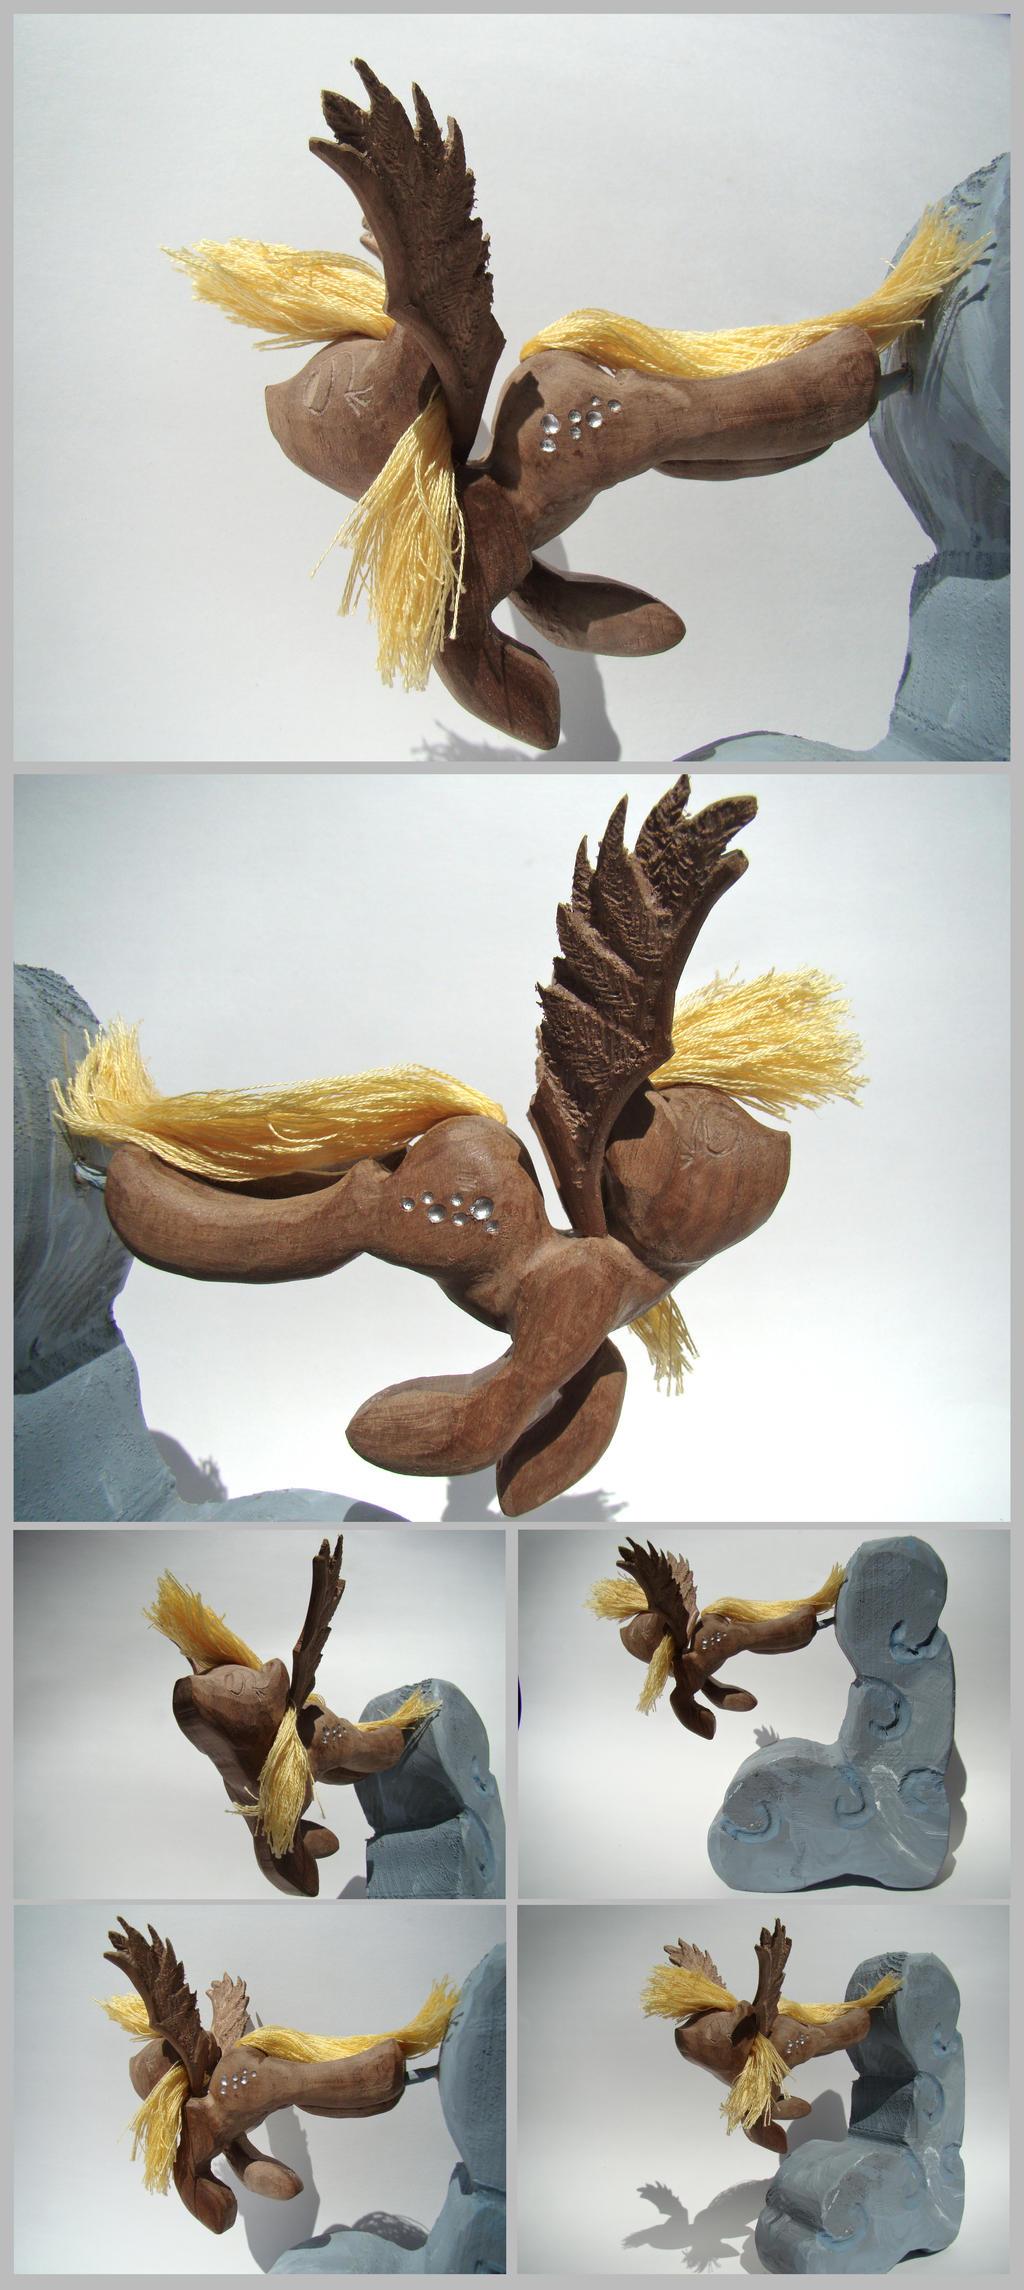 Derpy Hooves: Pony 100 by xofox